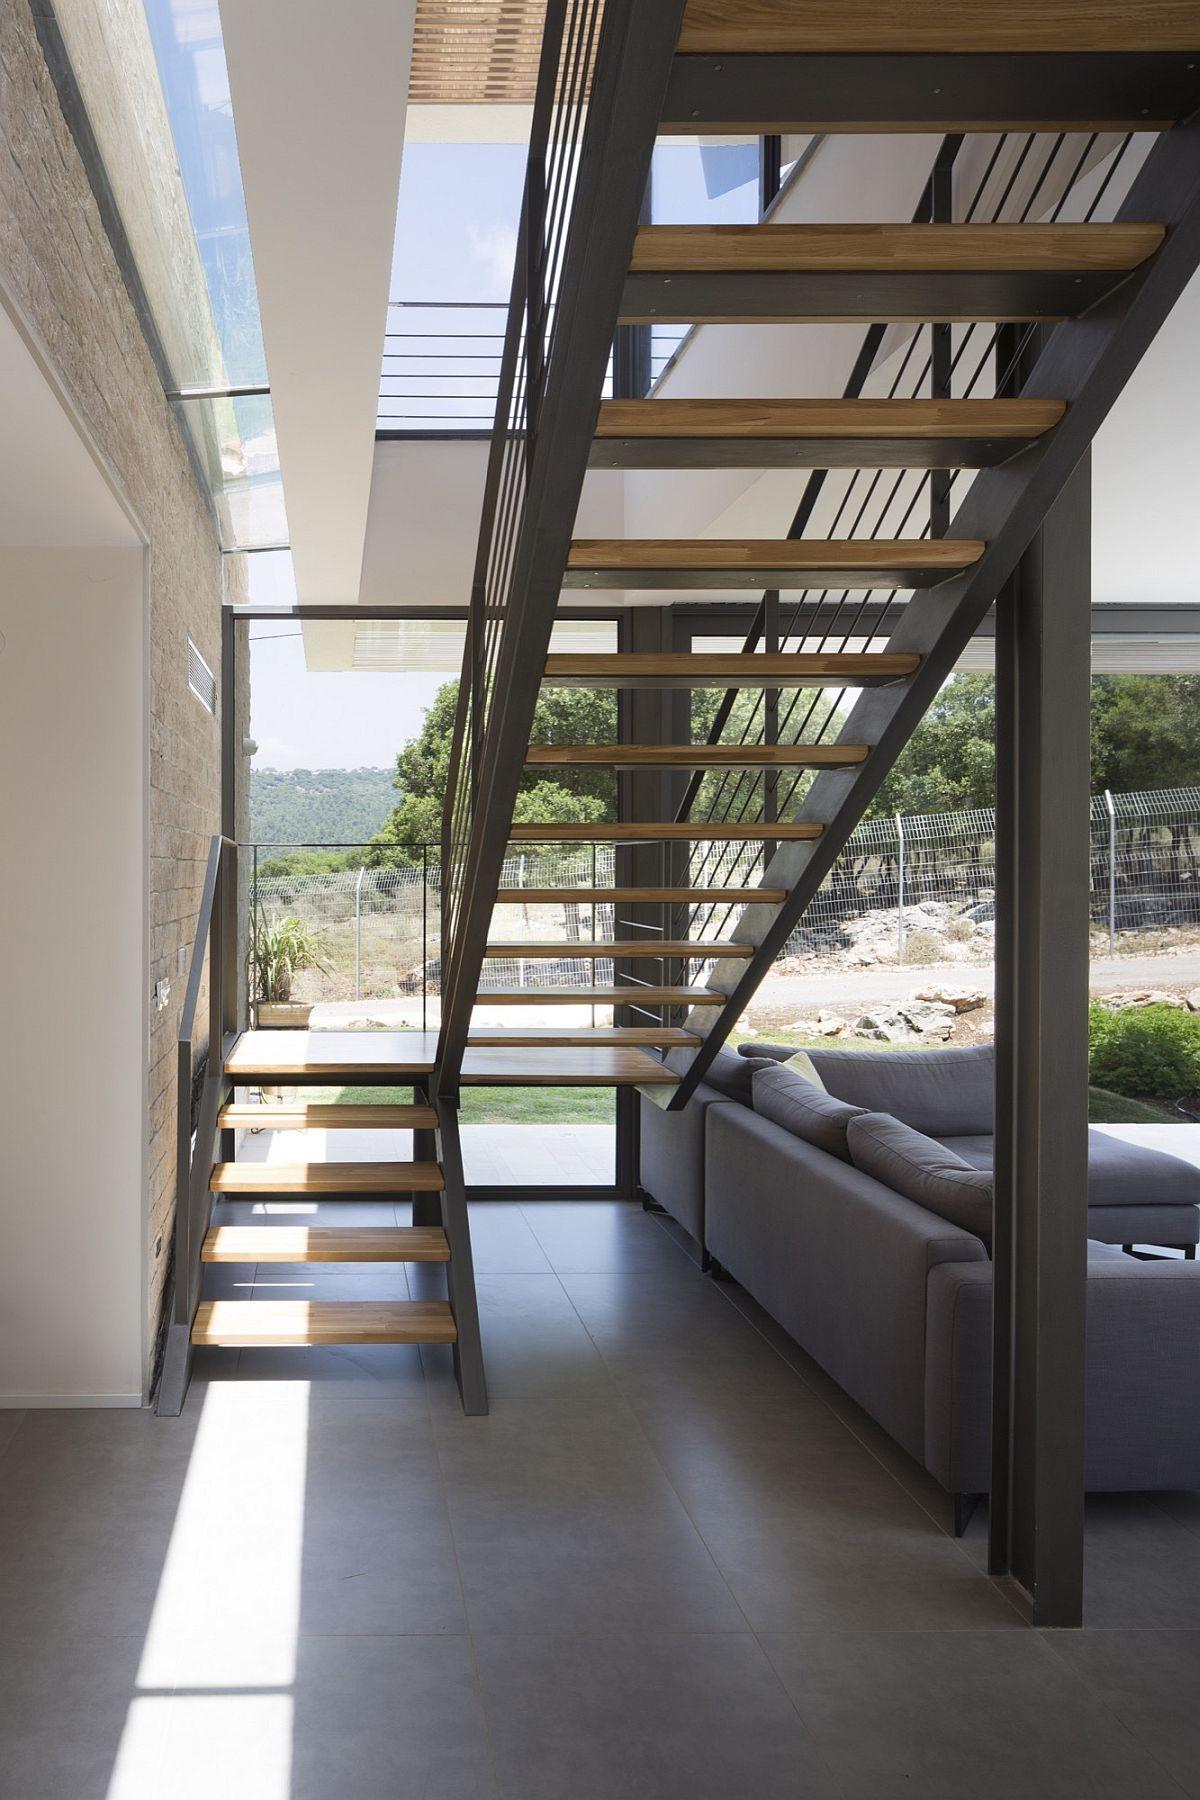 Metallic staircase gives the interior an edgy contemporary vibe